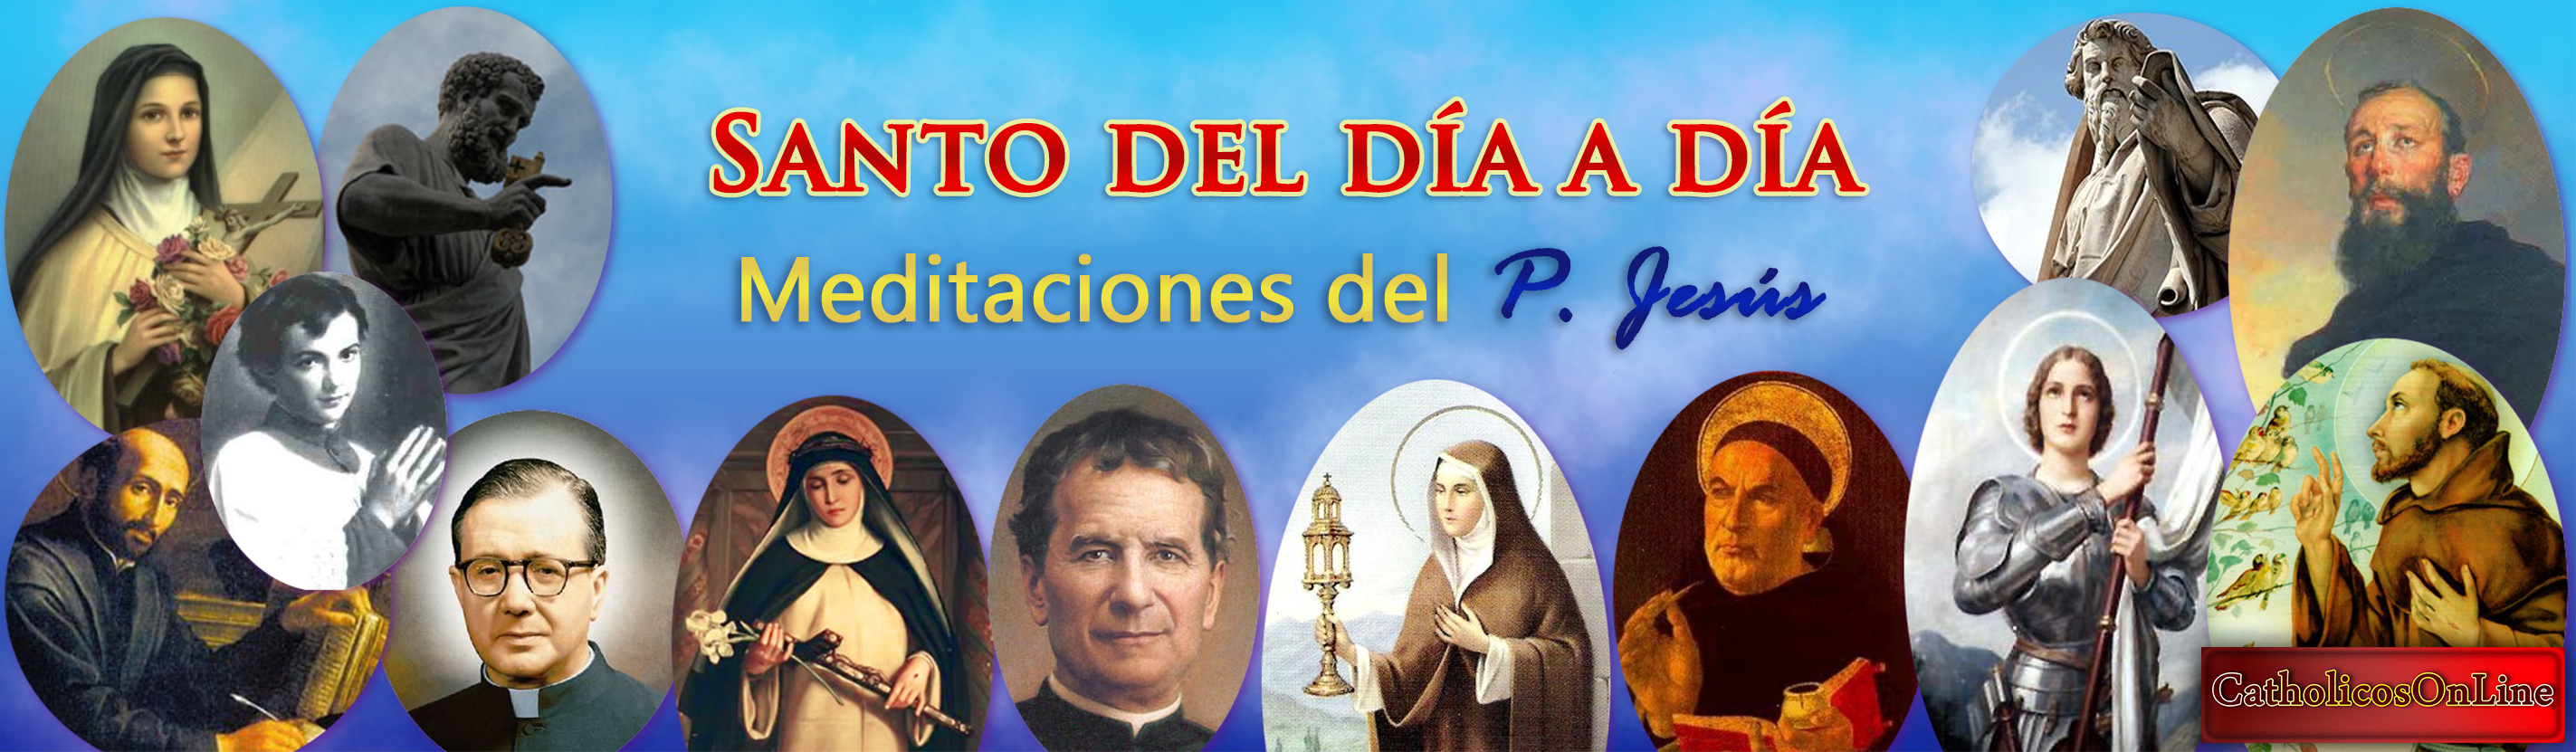 Servicio de CatholicosOnLine